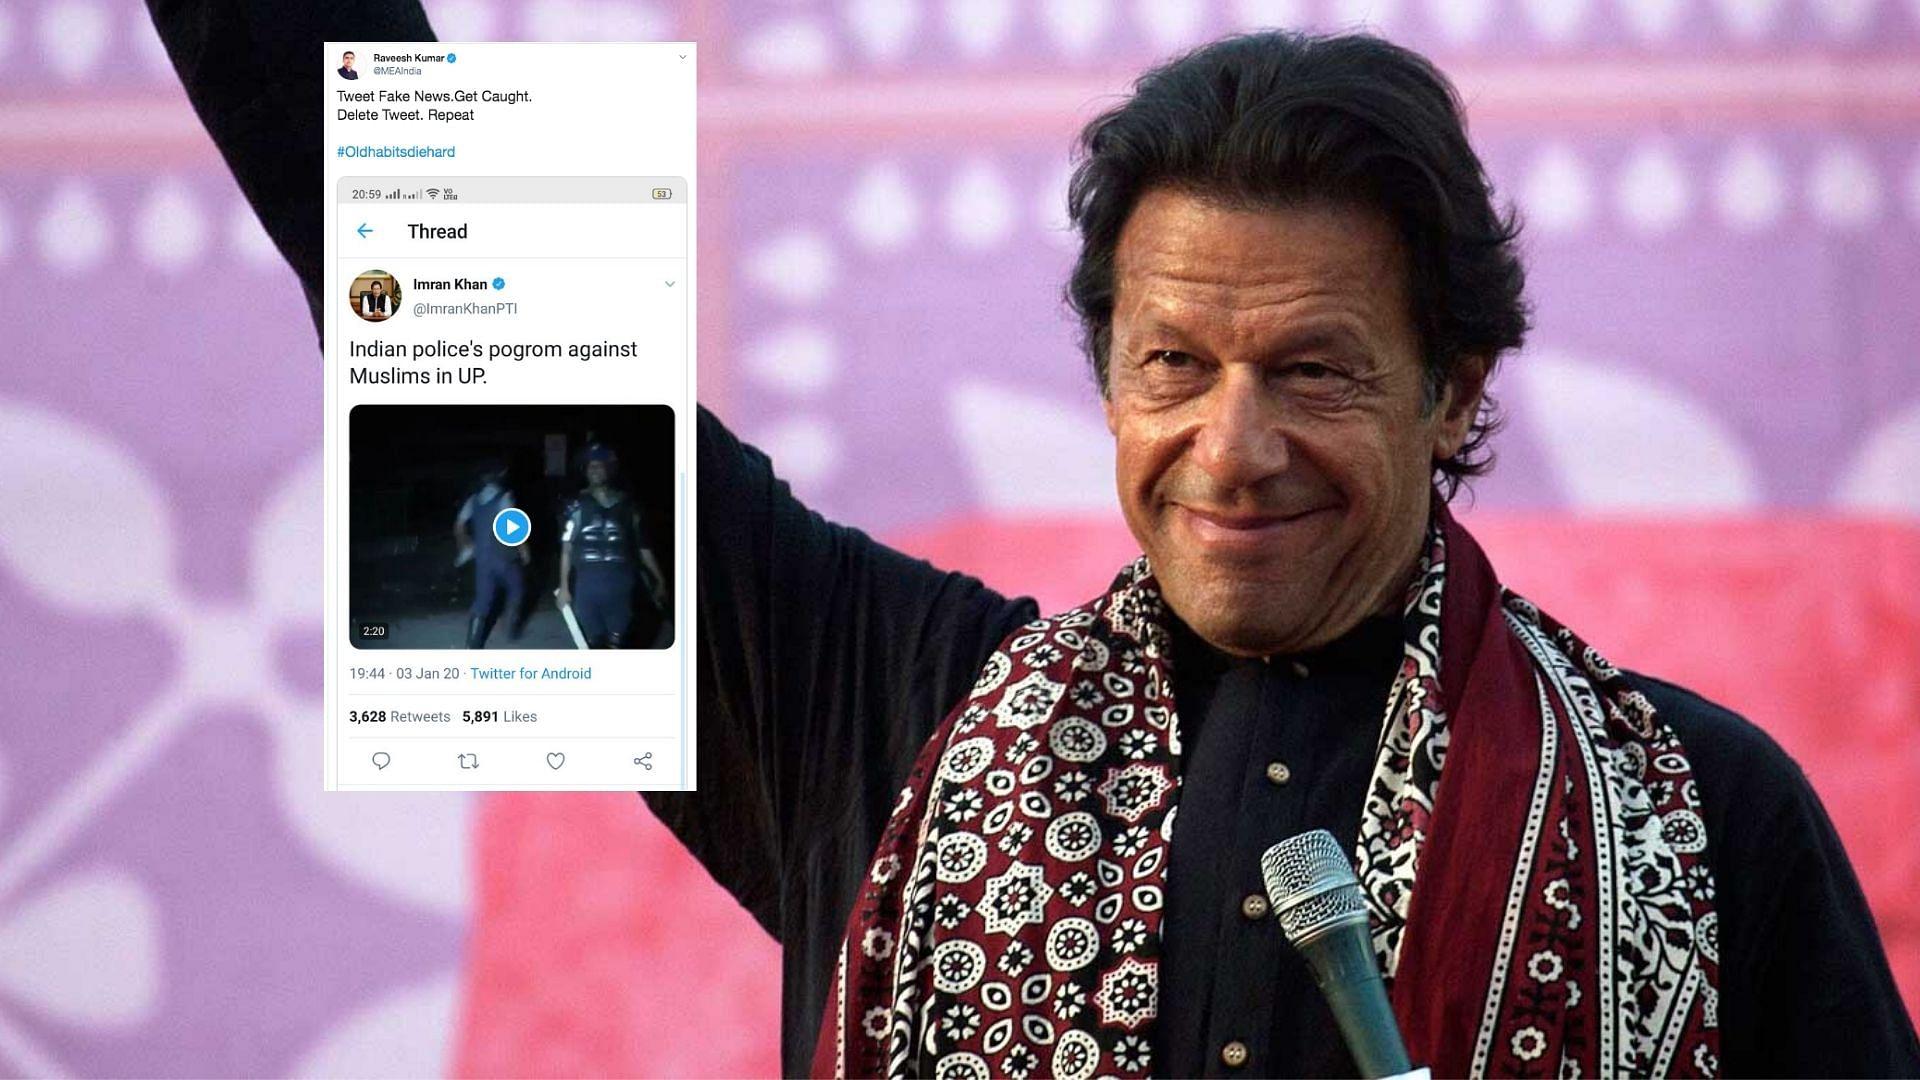 'Old Habits Die Hard': MEA Slams Pak PM Imran Khan for 'Fake News'